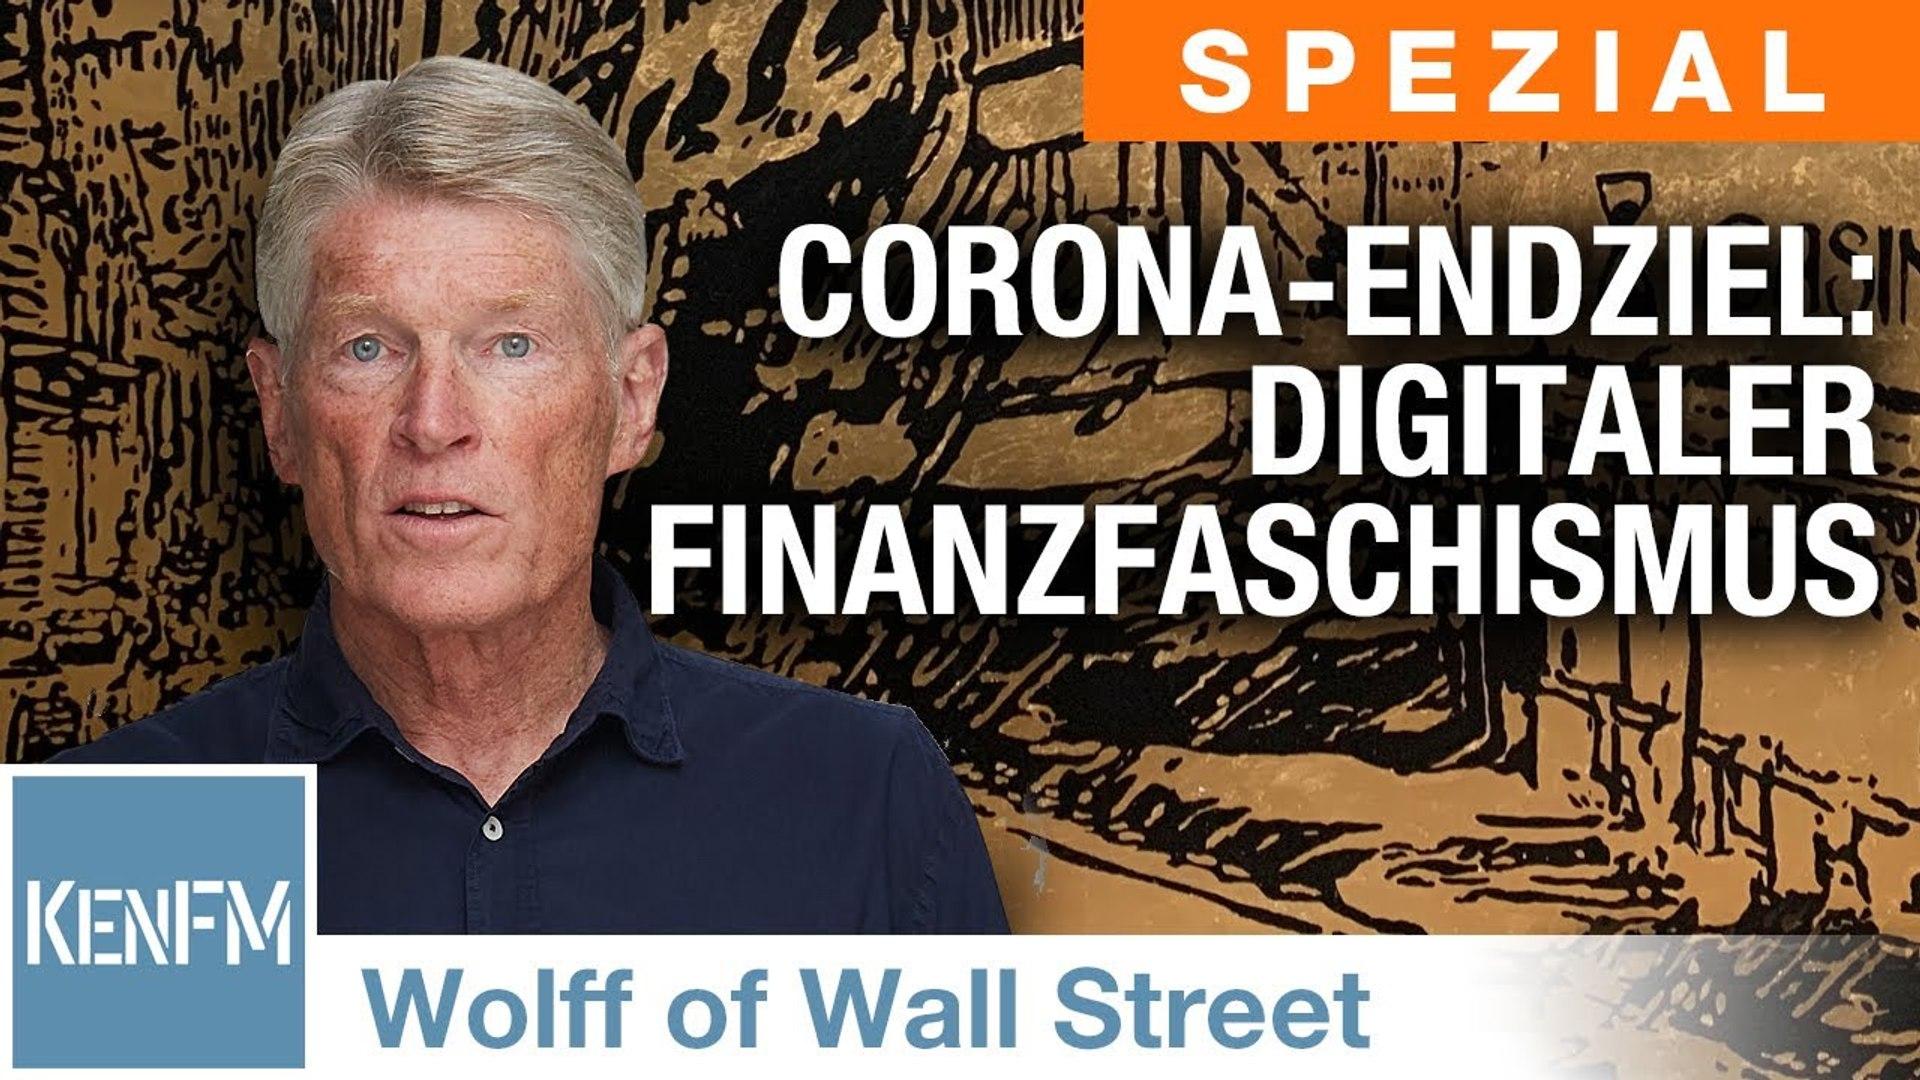 The Wolff of Wall Street SPEZIAL: Corona-Pandemie – Endziel: Digitaler Finanzfaschismus